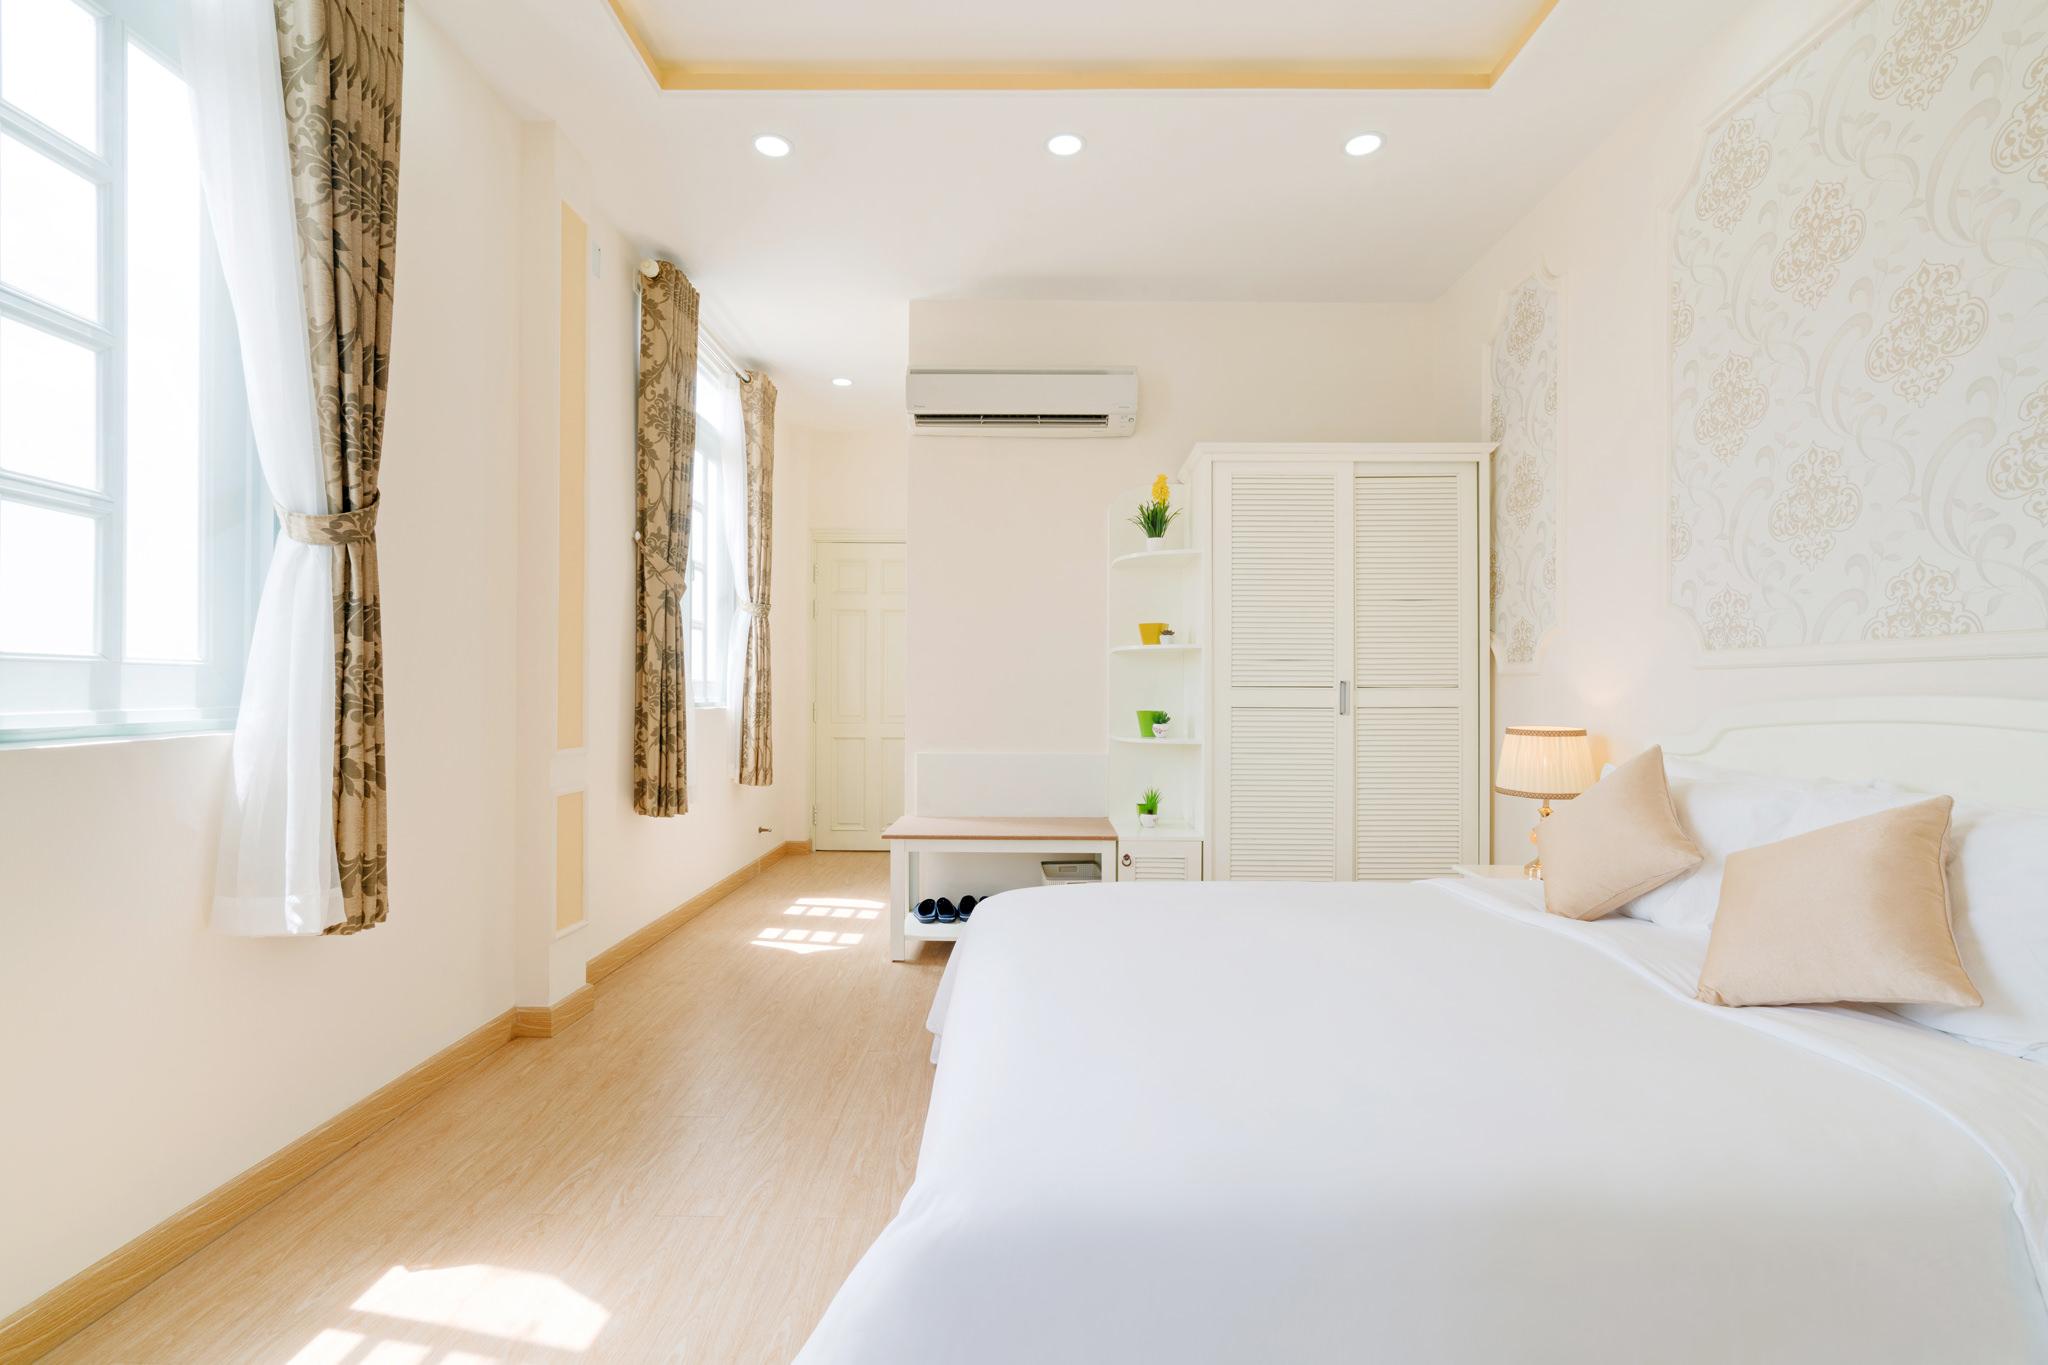 20180529 - Chez Mimosa - Interior - Hotel - 027.jpg